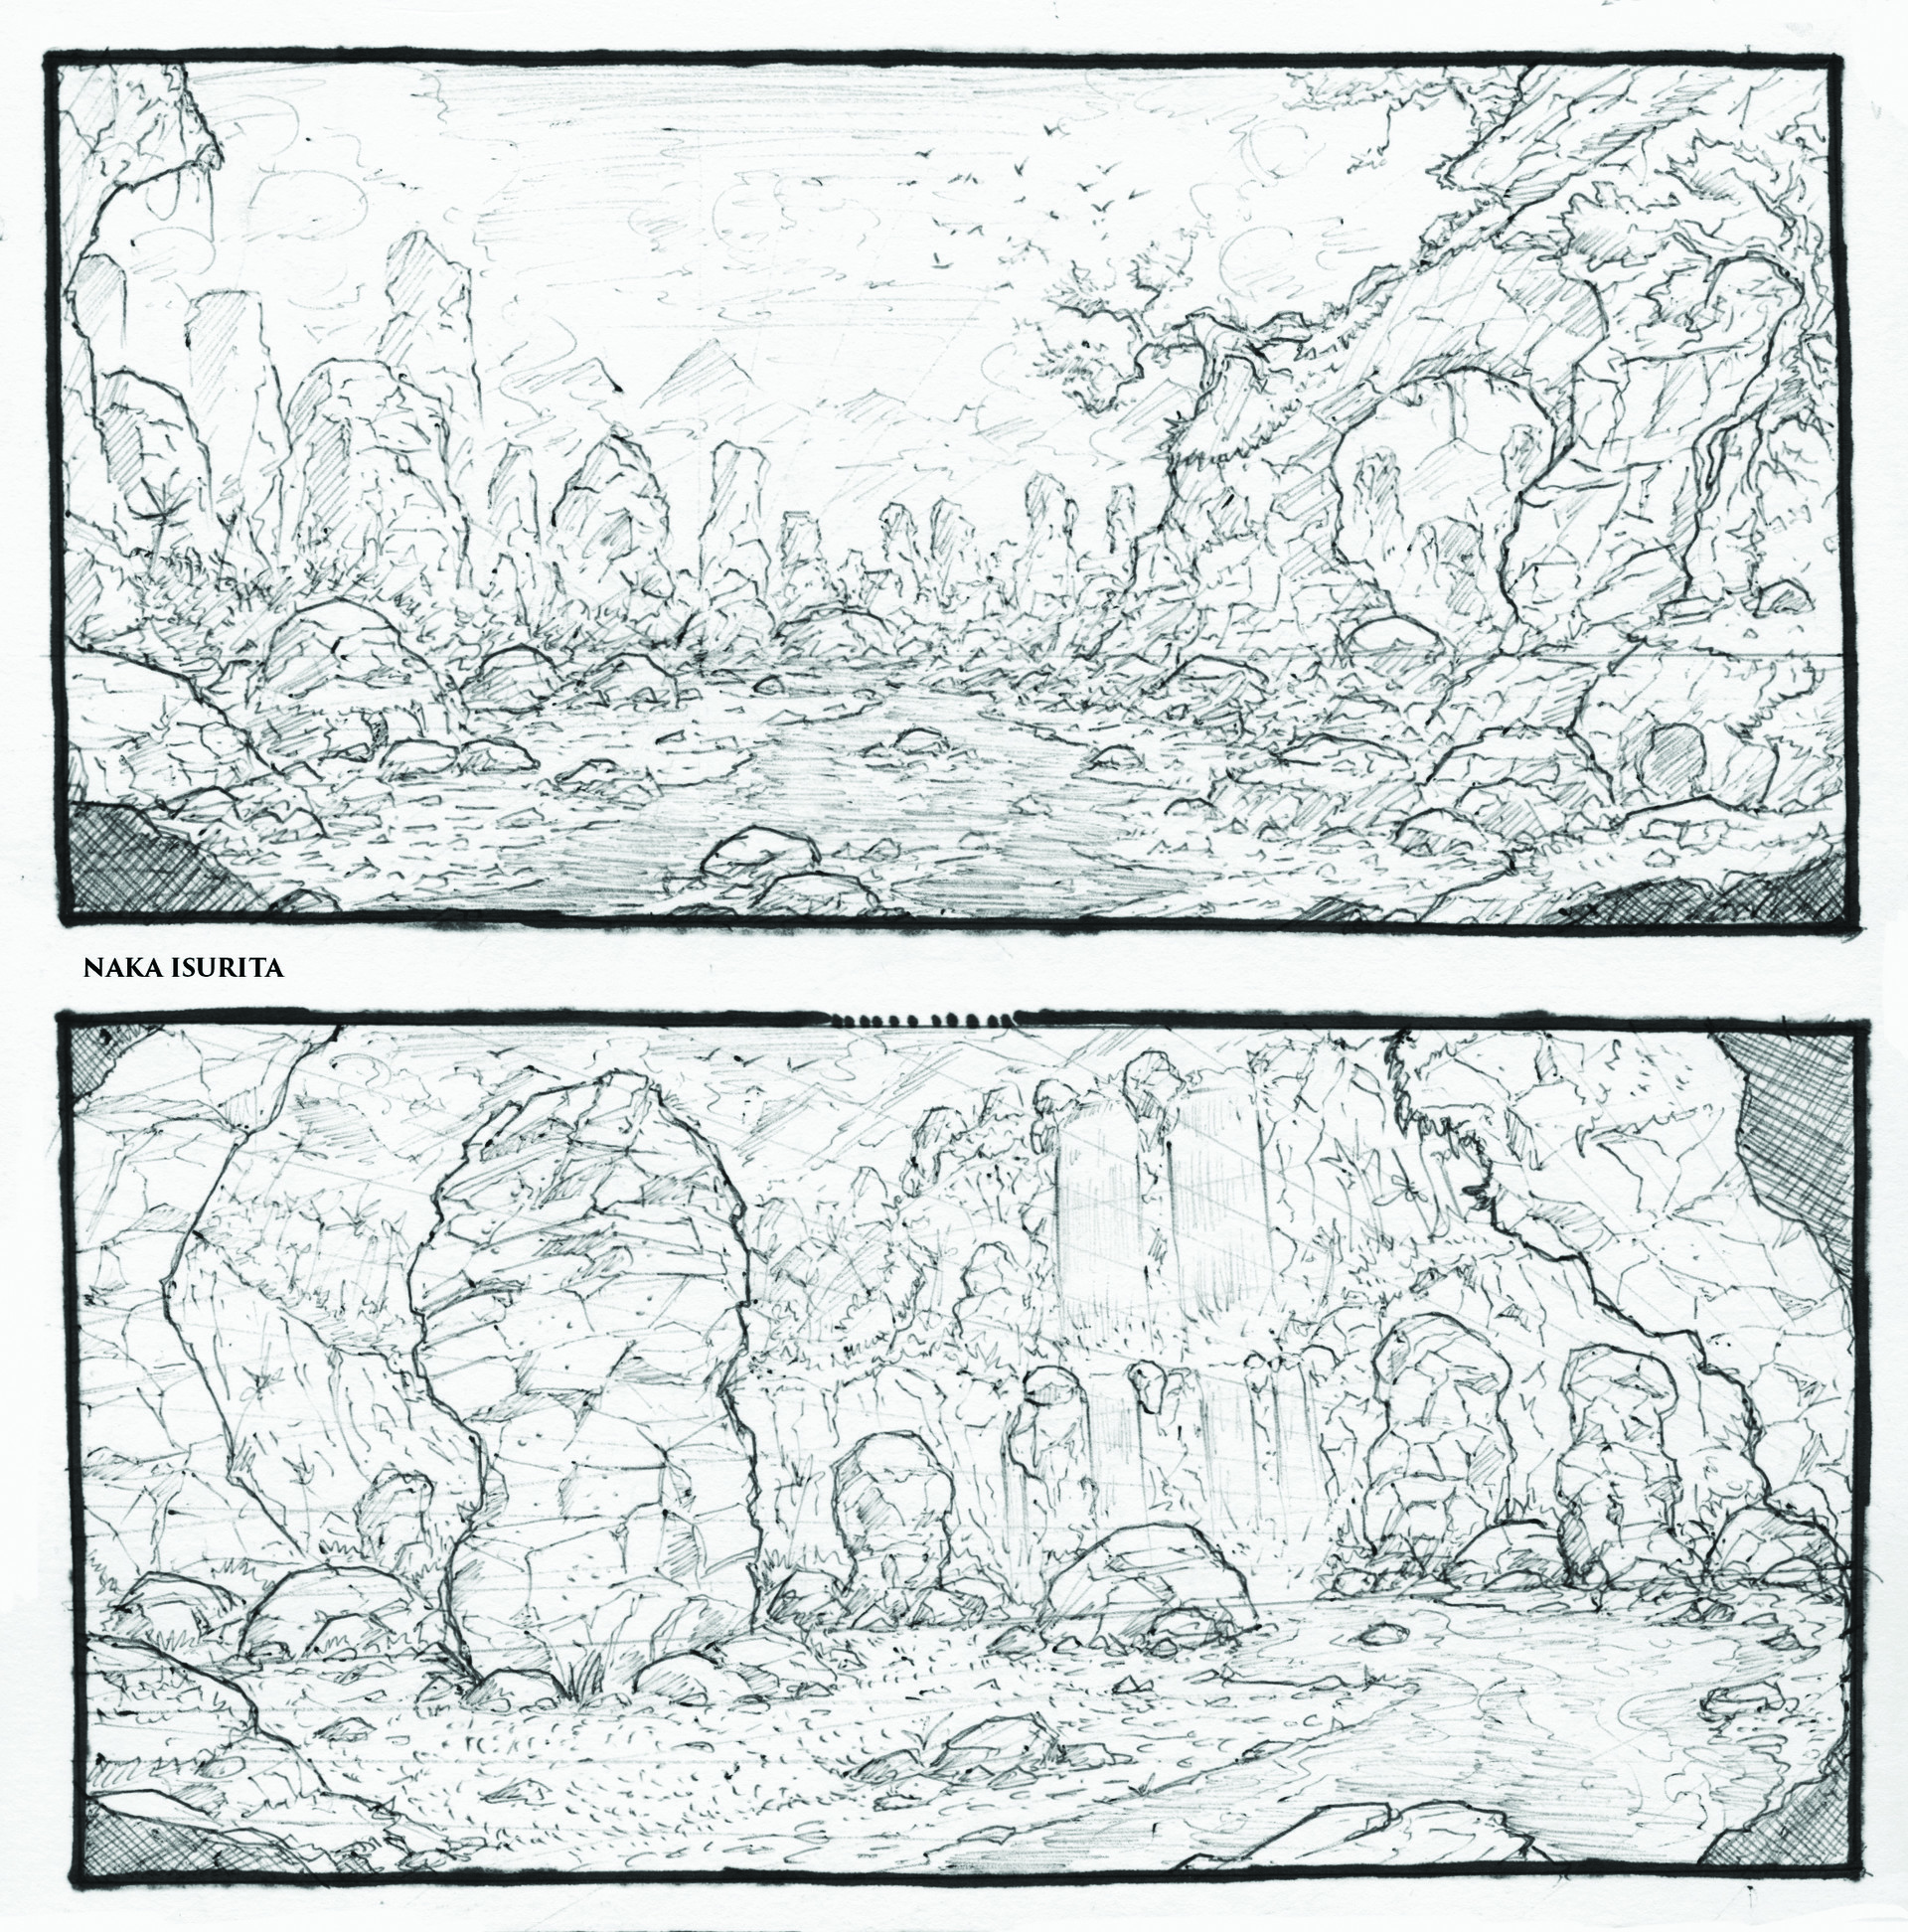 Naka isurita environment sketch 04